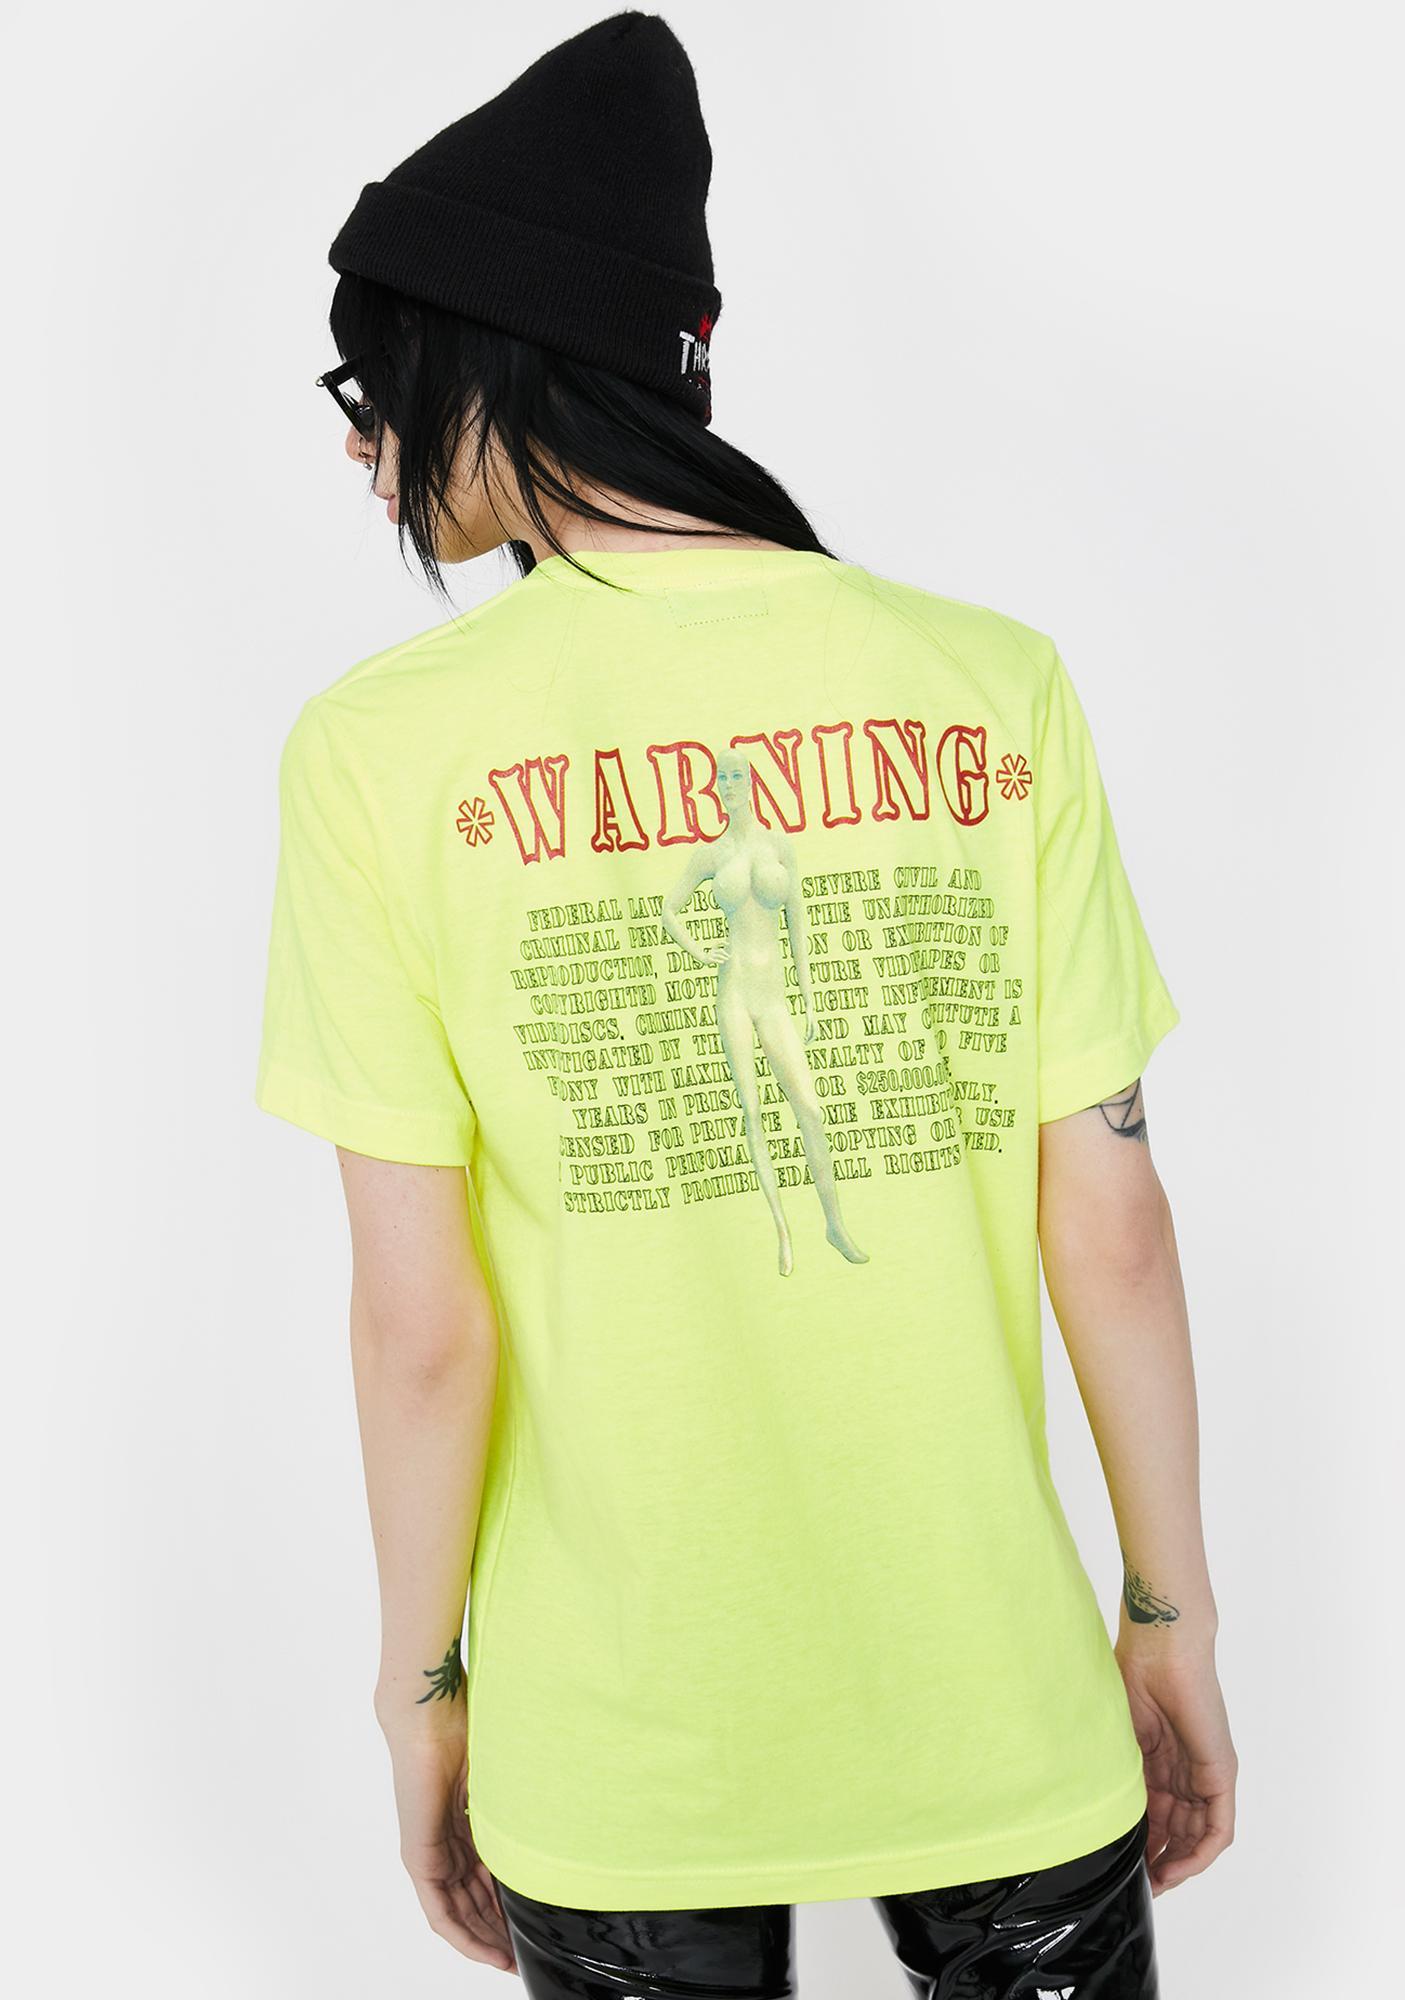 Funeral Neon Yellow Warning Graphic Tee